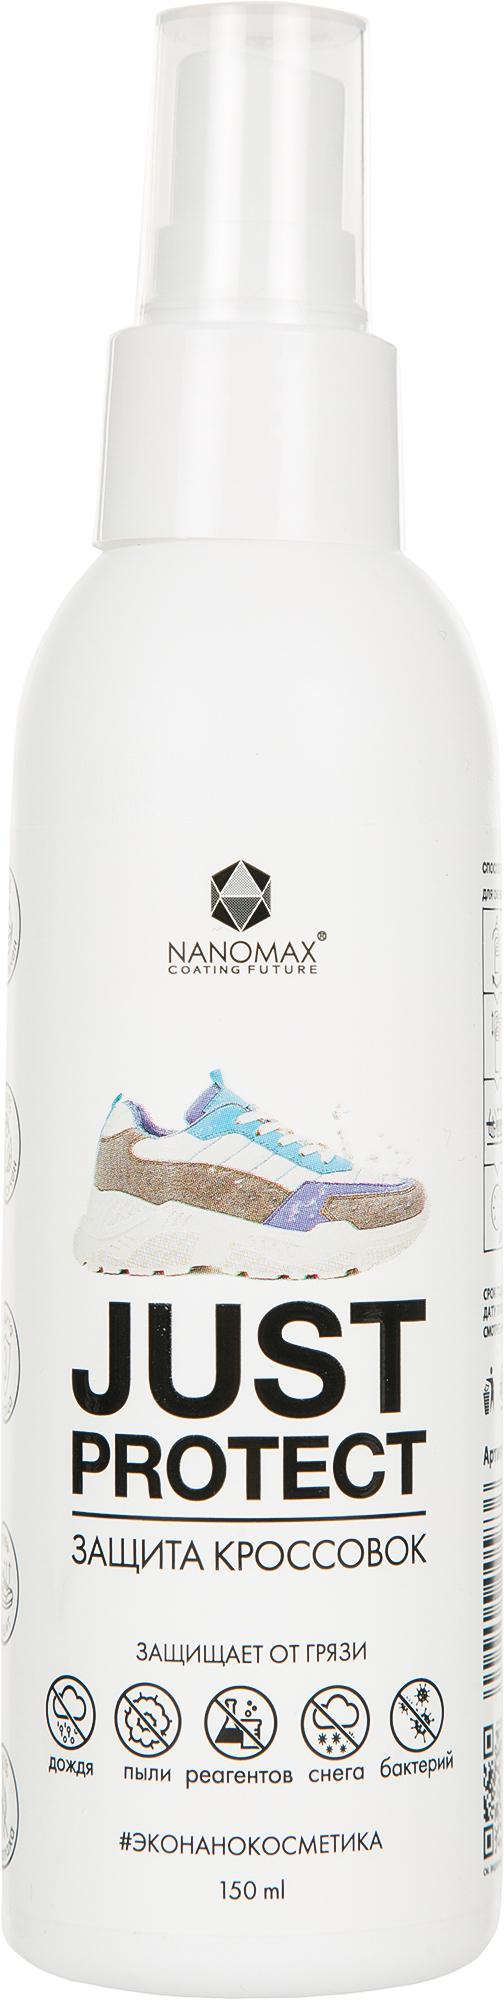 Nanomax Средство для ухода за обувью Just Protect